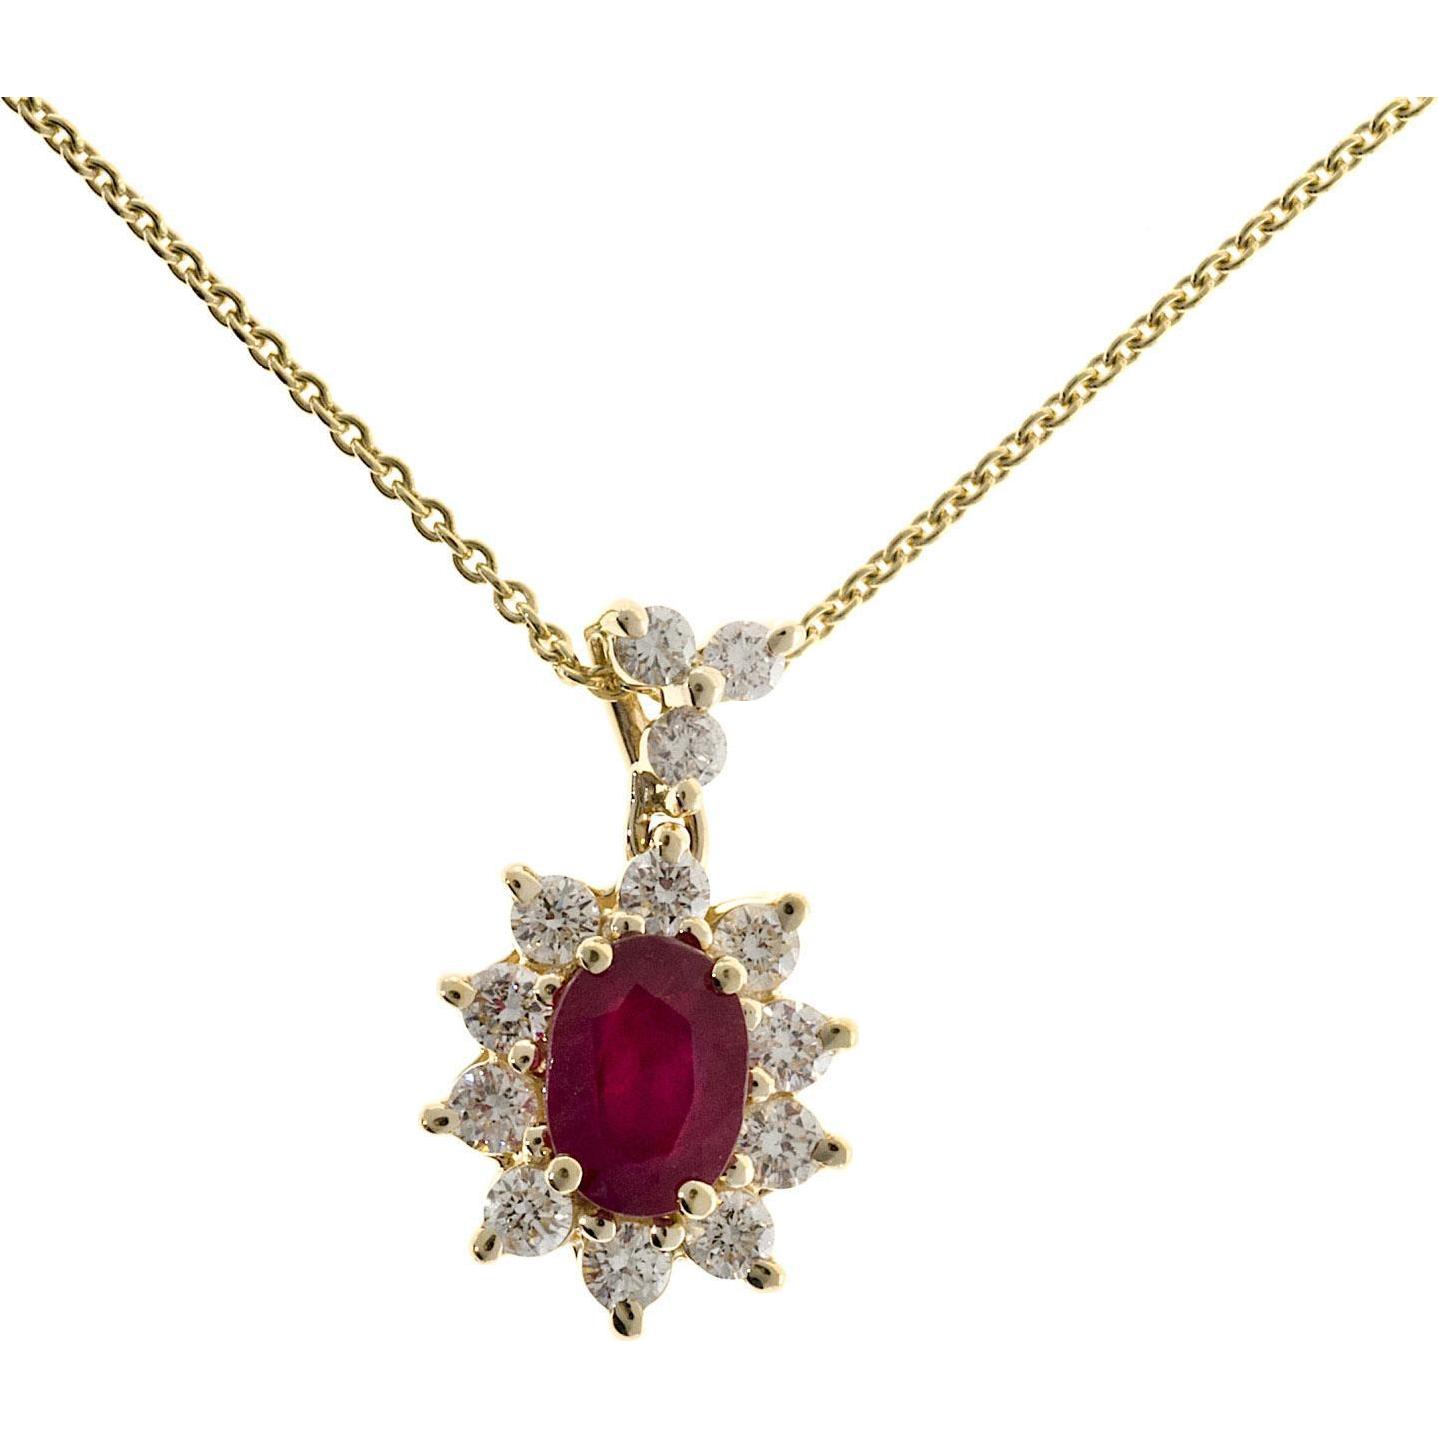 Oval Ruby Diamond Halo 14 Karat Yellow Gold Pendant Necklace